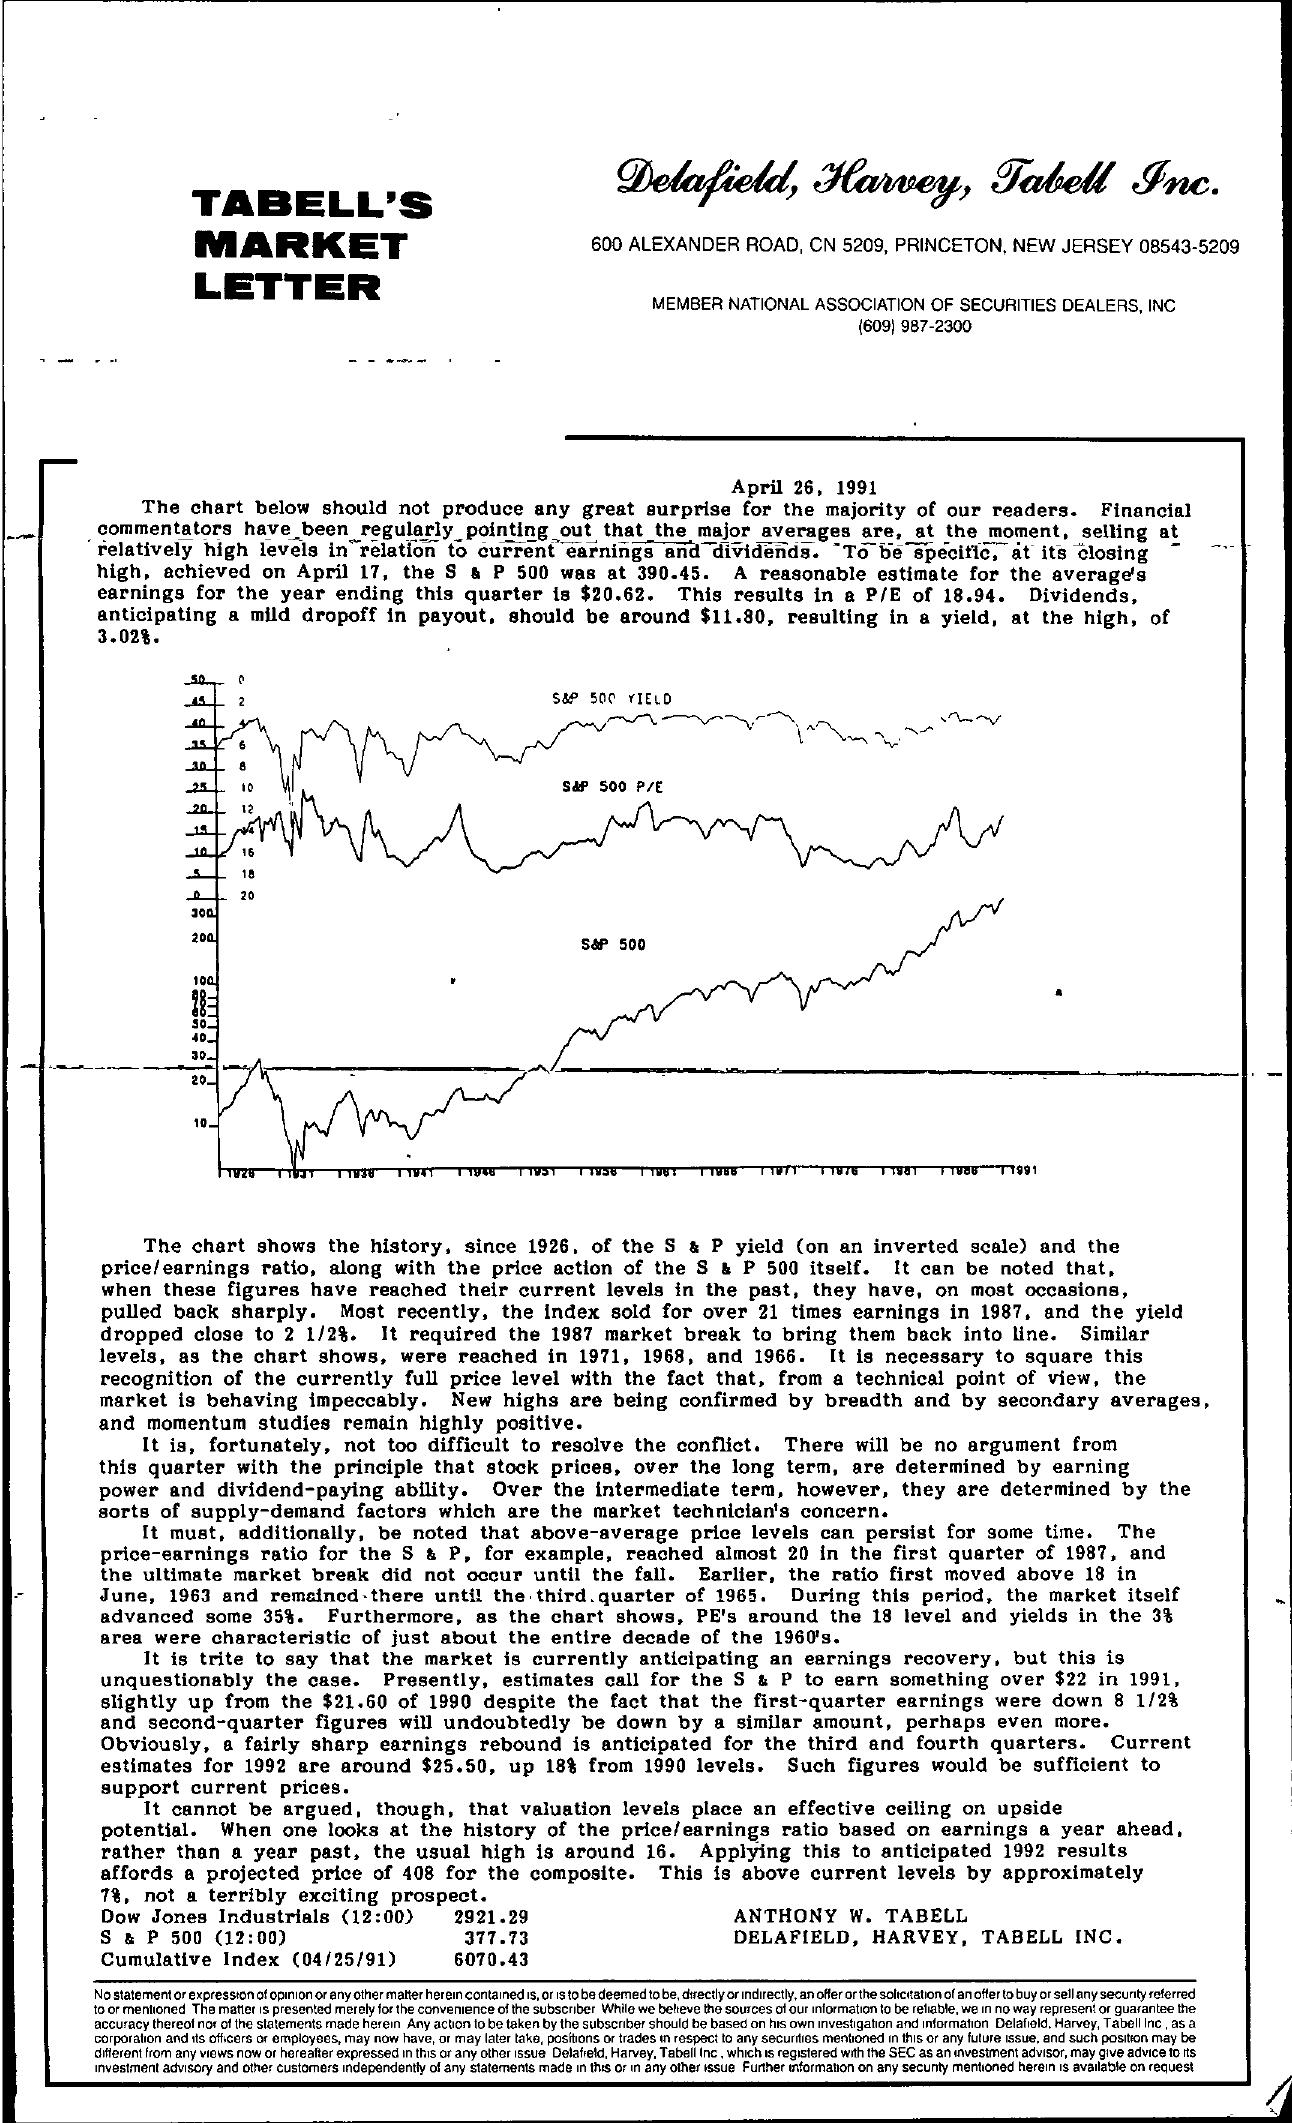 Tabell's Market Letter - April 26, 1991